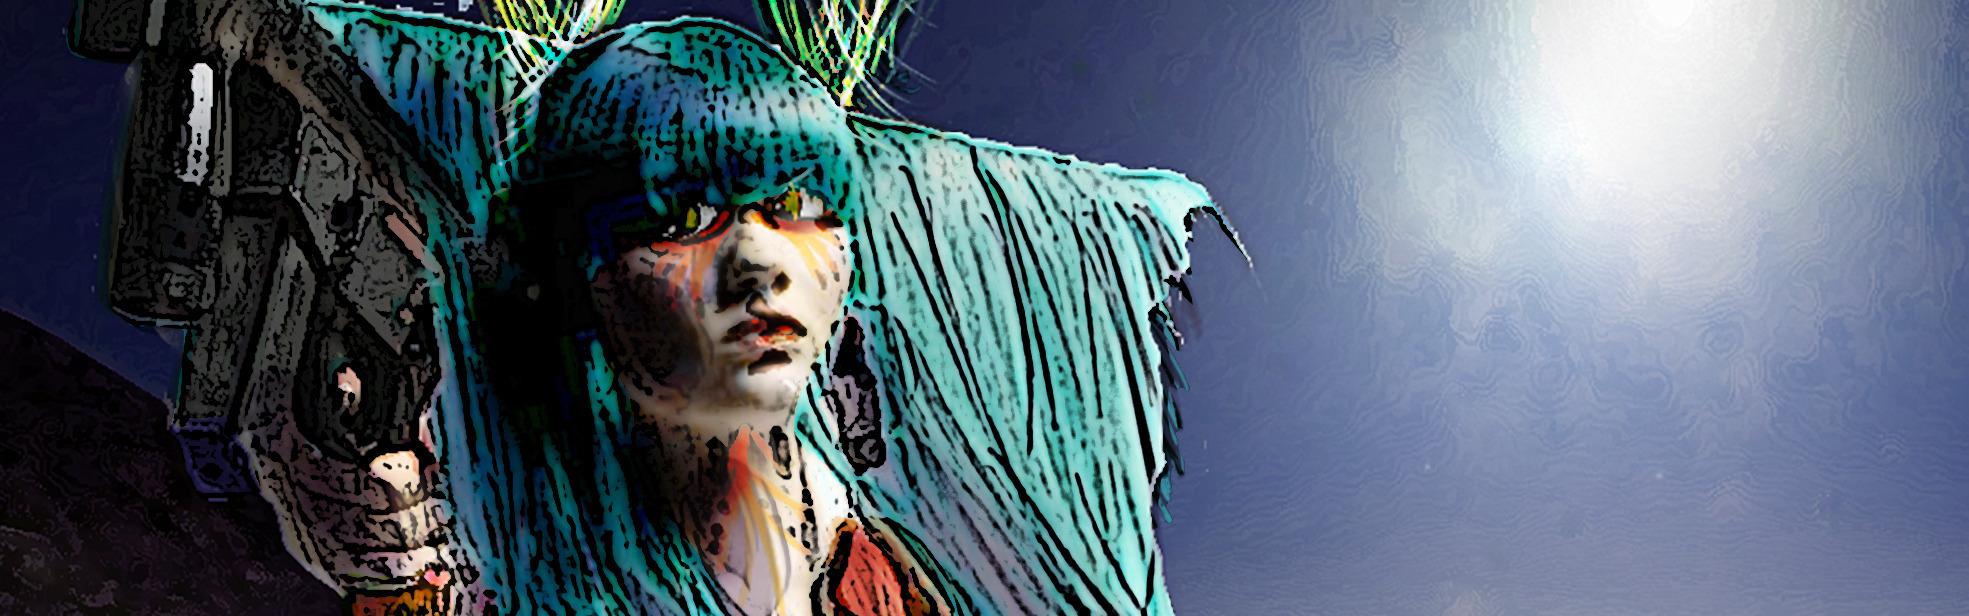 Laura-Susan (@lsismoresaidtheseismiccow) Cover Image